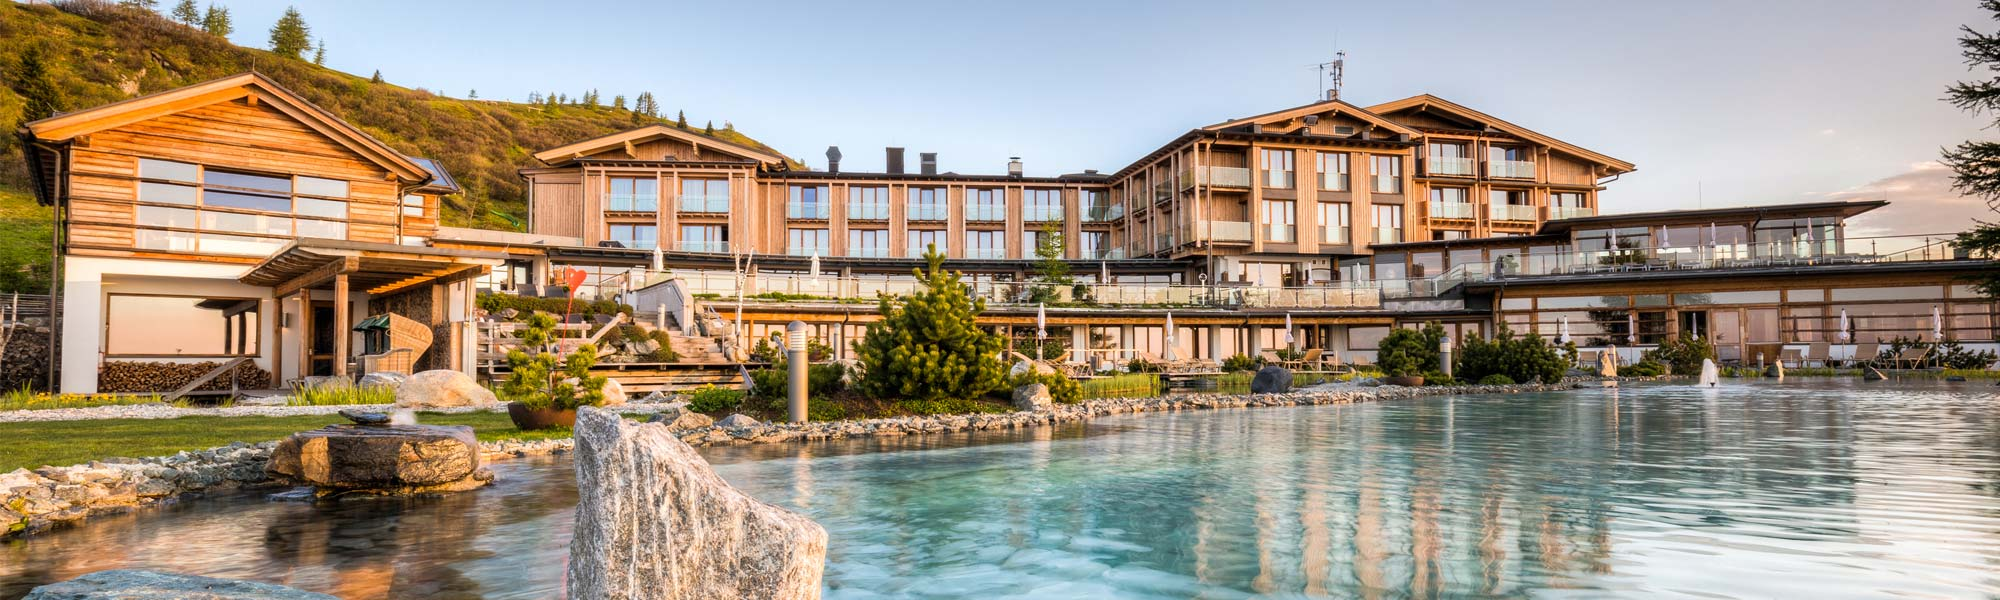 Feuerberg Mountain Resort Relax Guide Bodensdorf